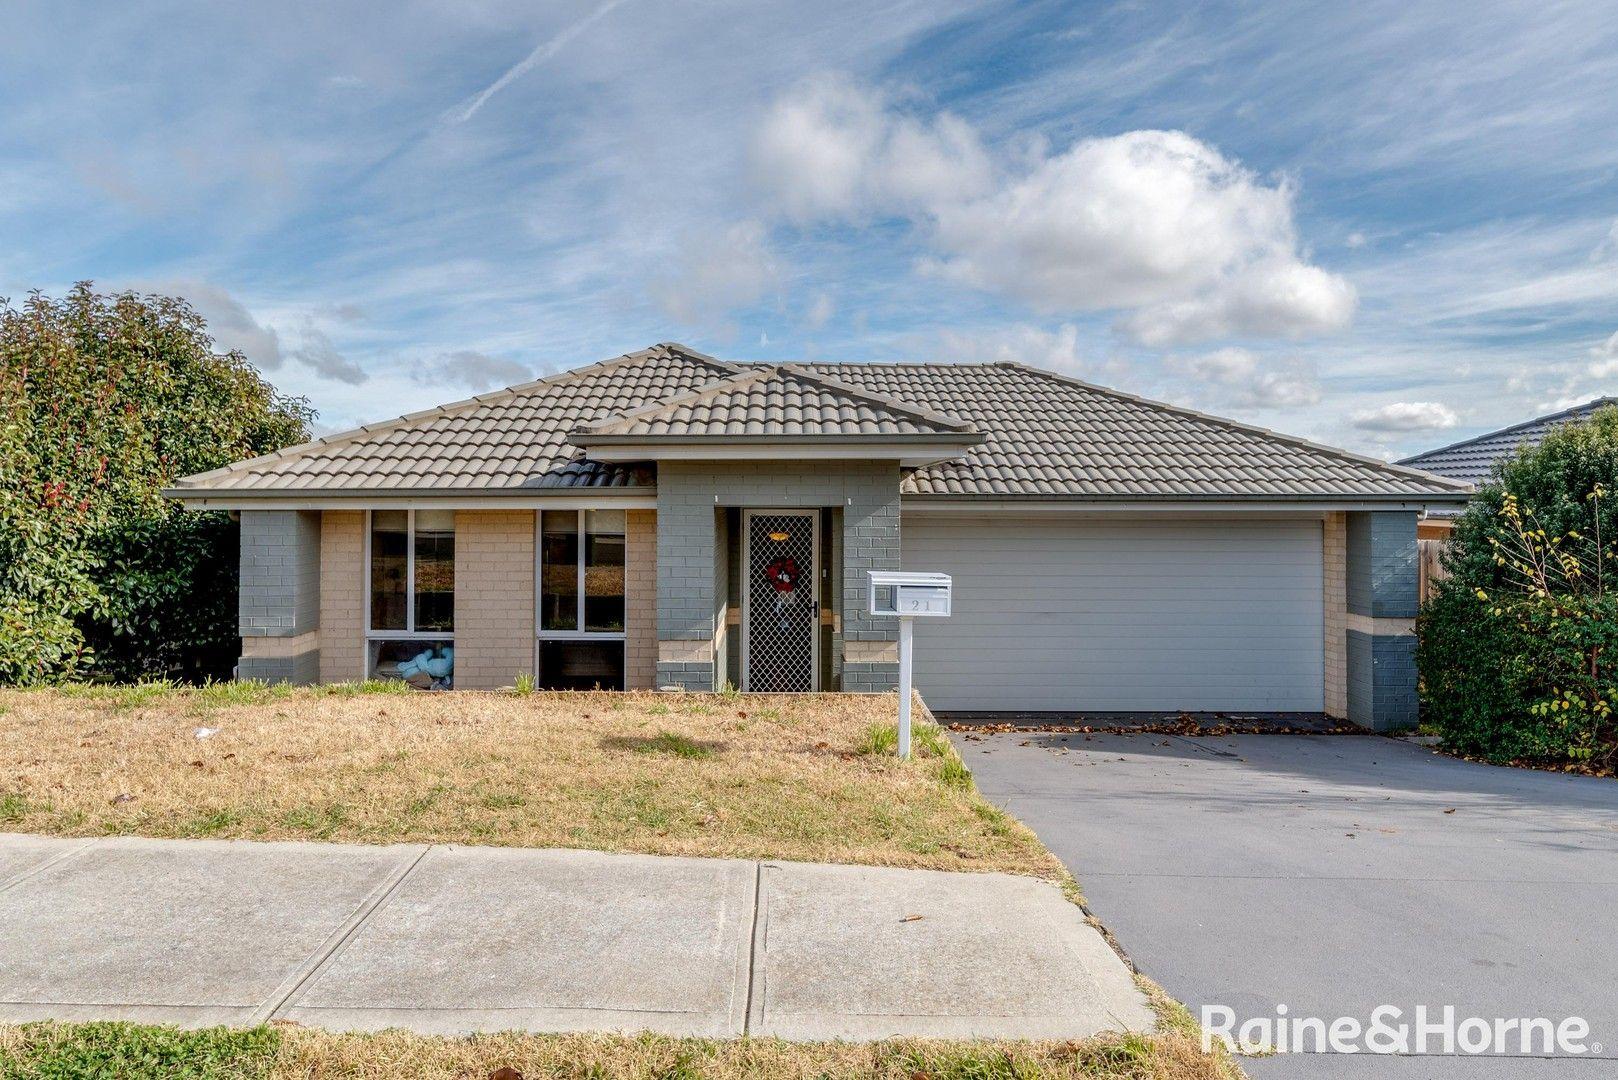 21 Fitzpatrick St, Goulburn NSW 2580, Image 0